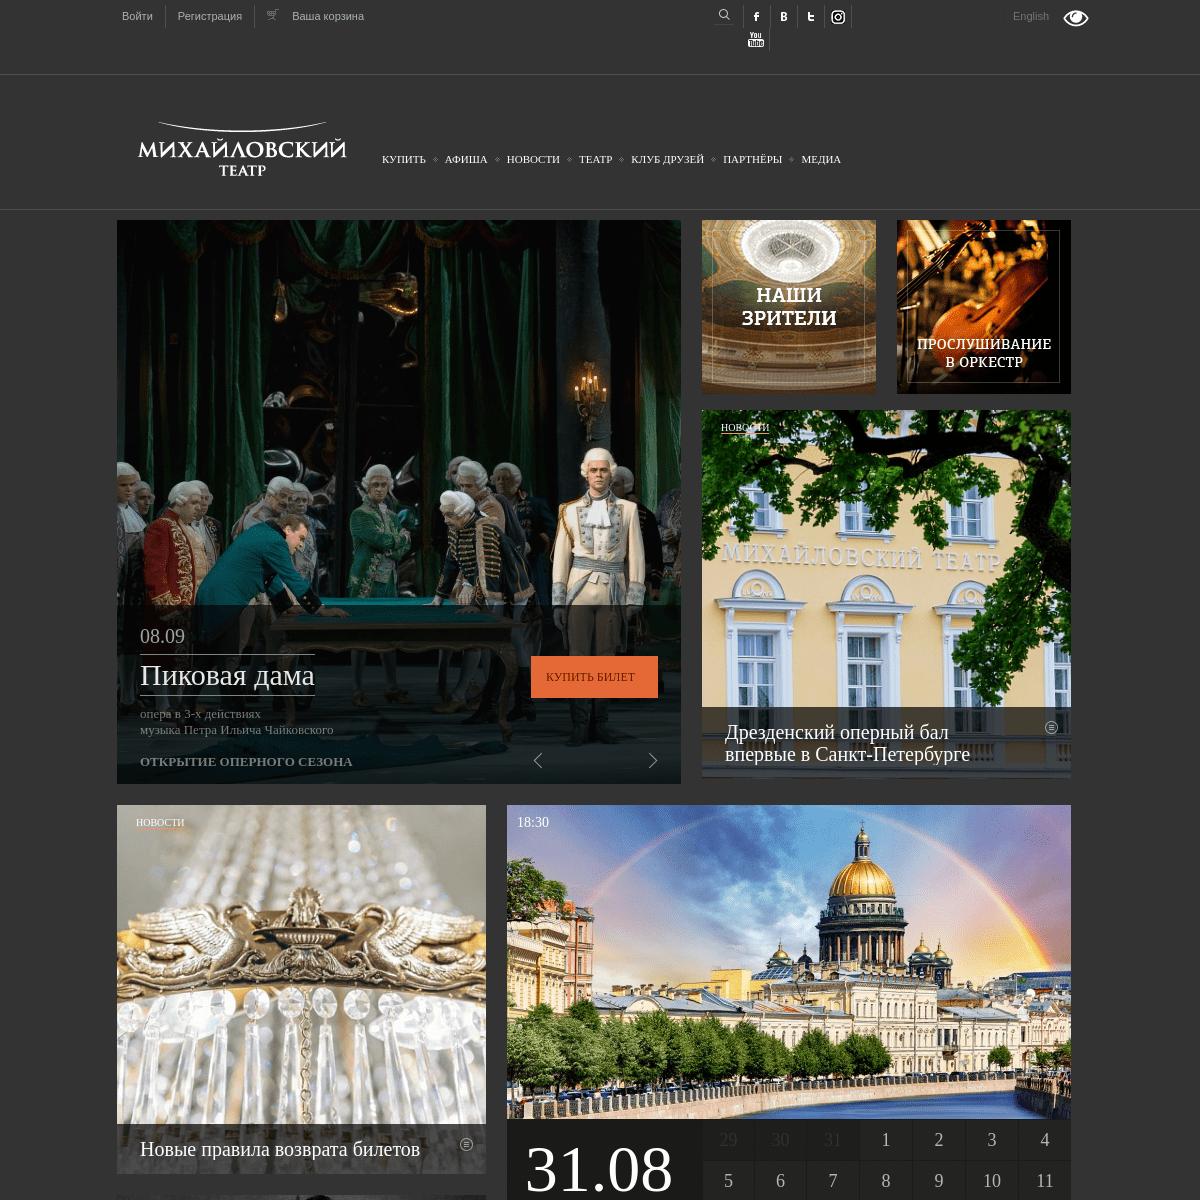 Михайловский театр Санкт-Петербург